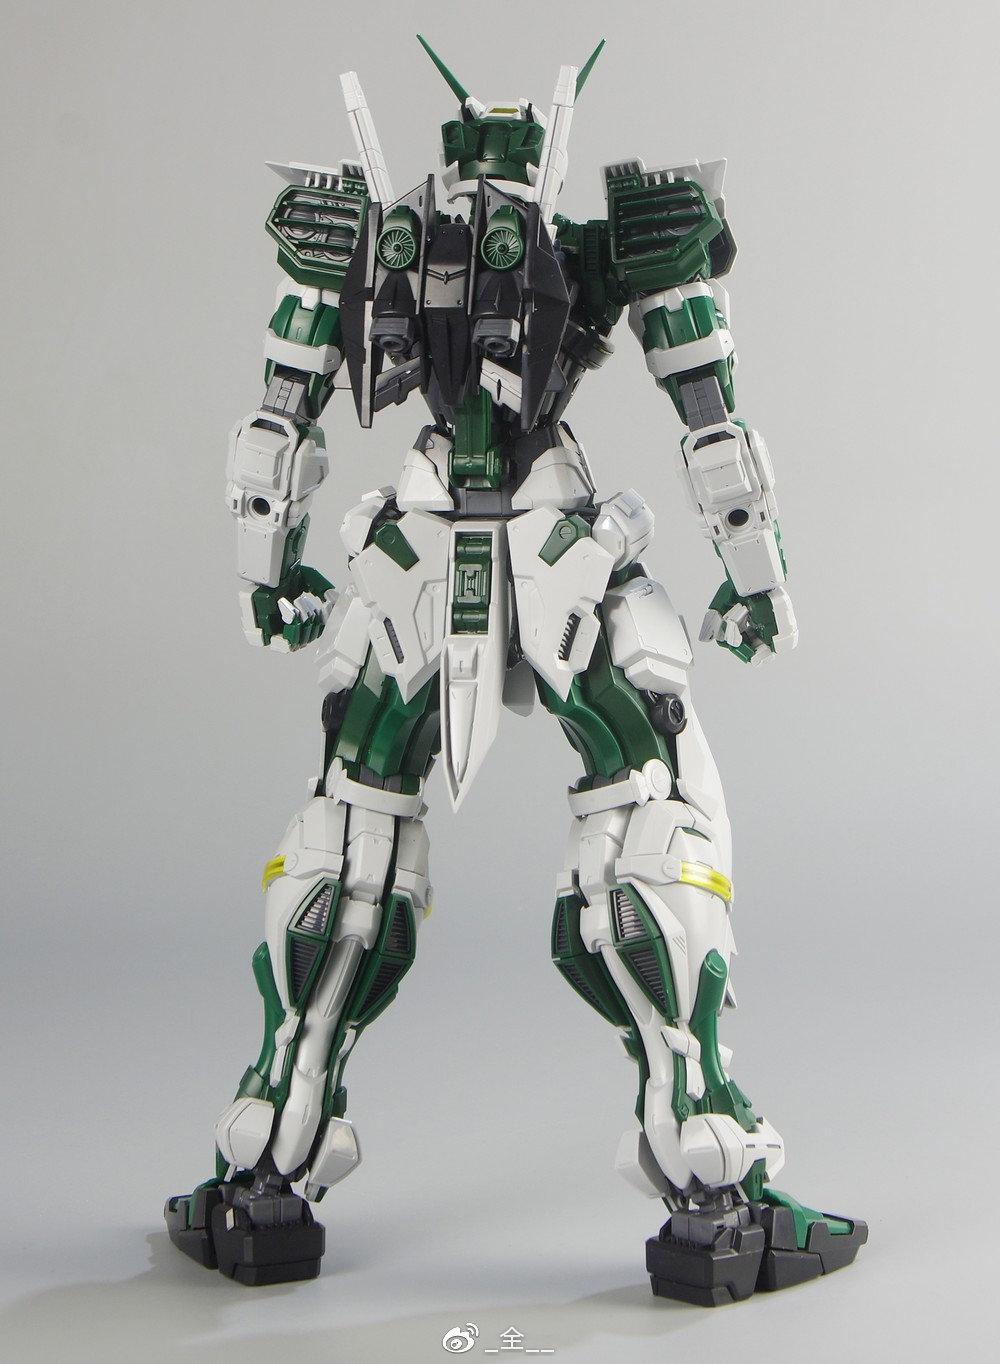 S417_60_astray_green_023.jpg